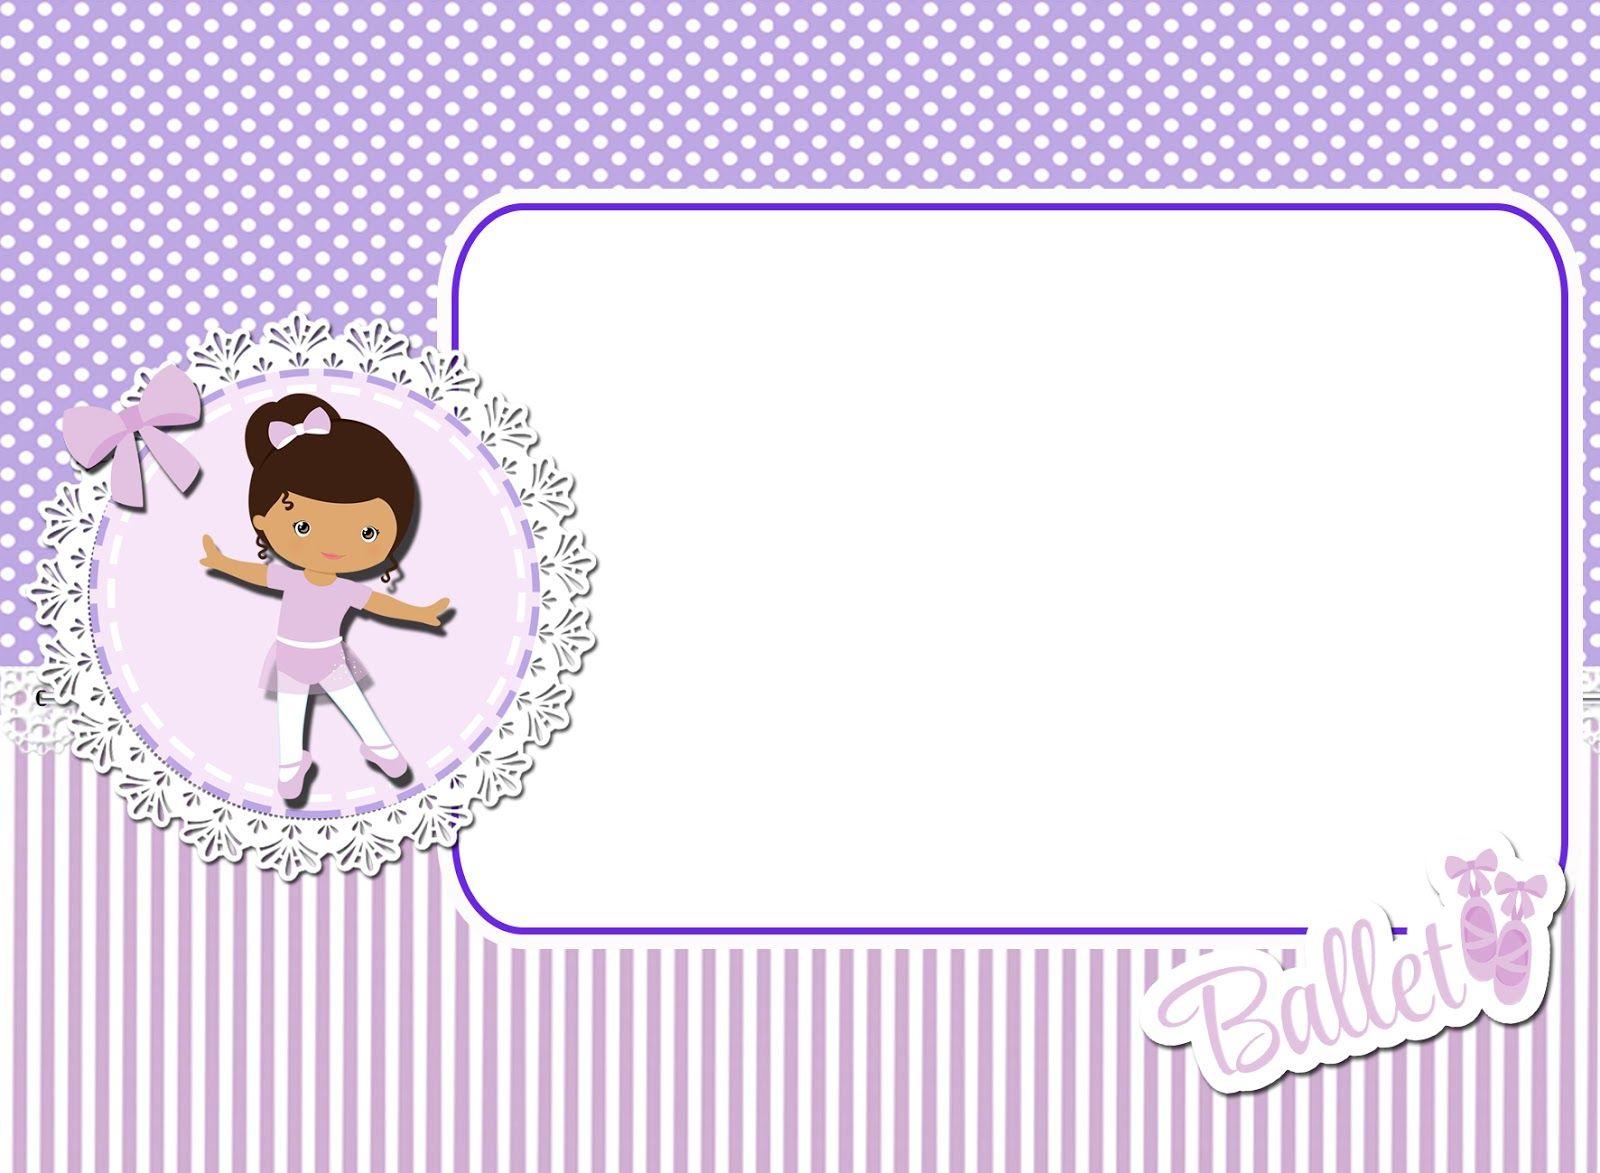 Kit personalizado para imprimir callys design kits personalizados kit personalizado para imprimir callys design kits personalizados gratuitos stopboris Choice Image